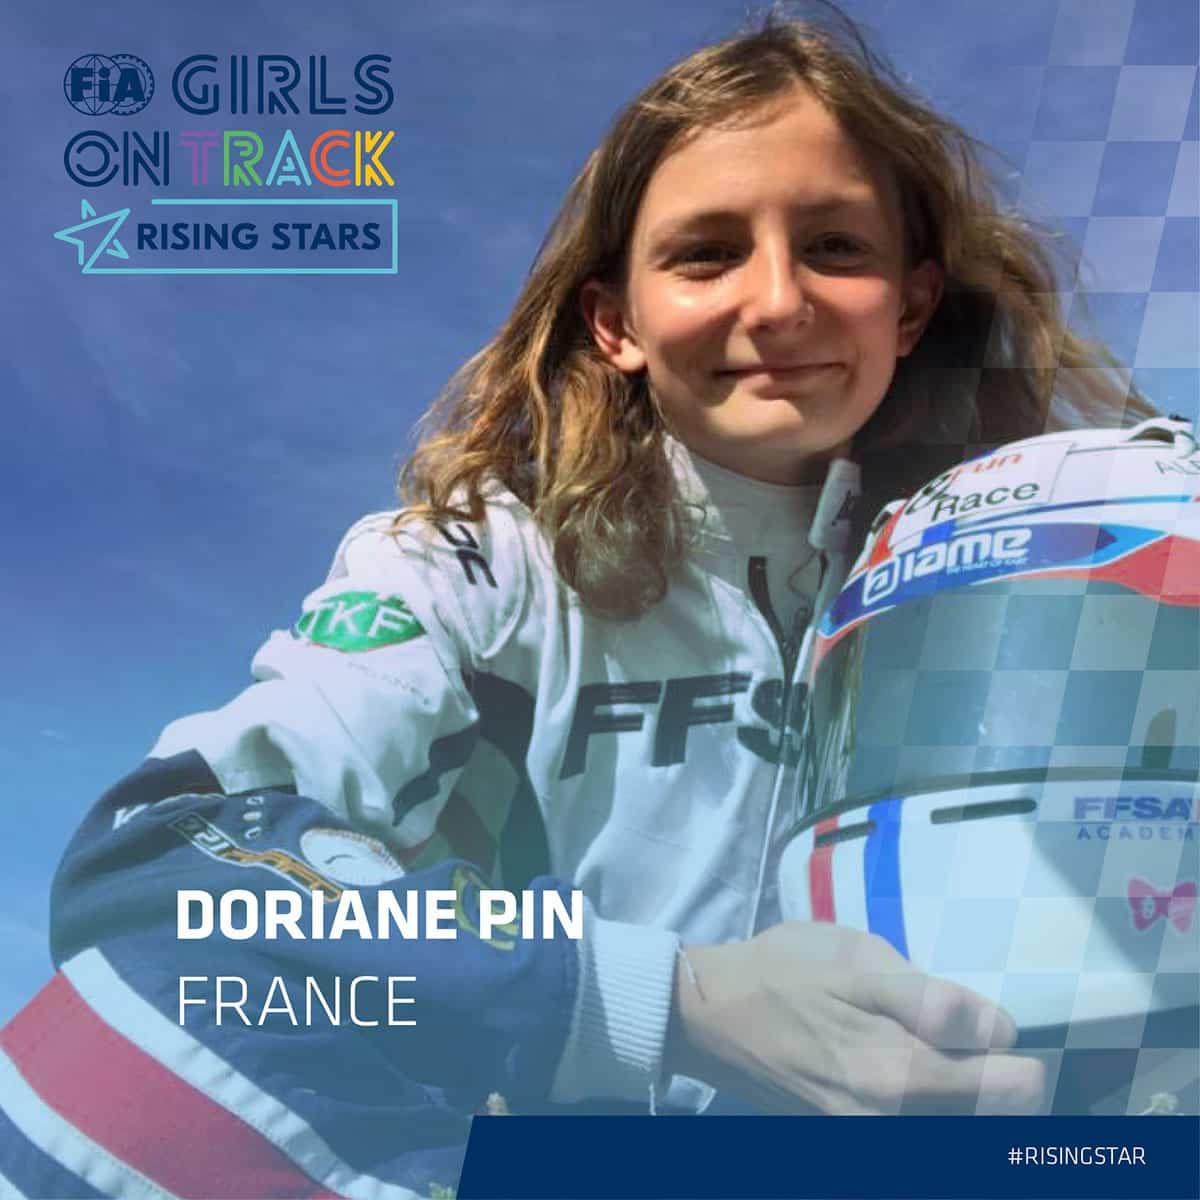 doriane-pin-wim-rising-star-social-media-1200